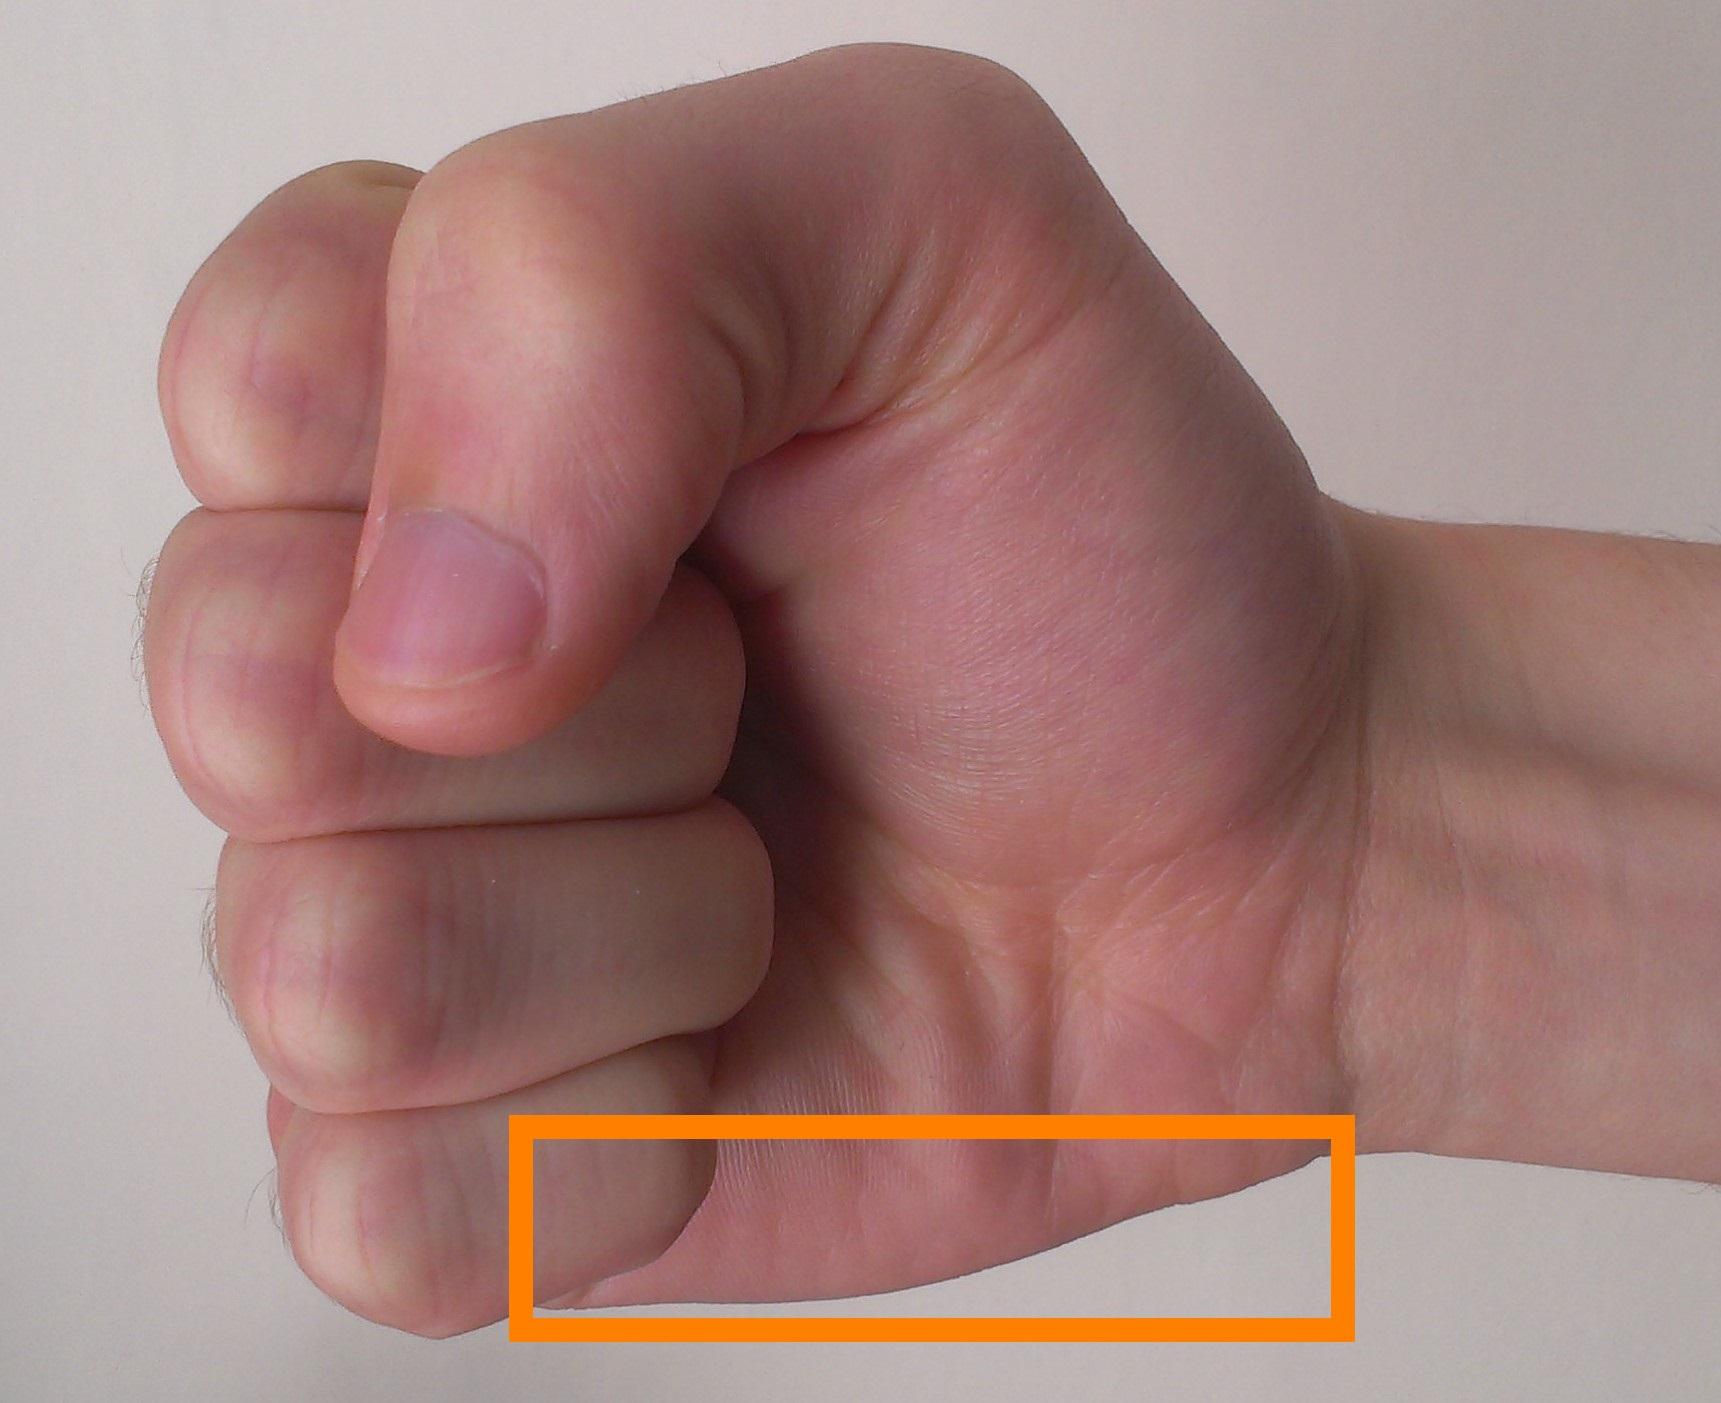 Hammer Fist Evolutionary Self Protection Wiki Fandom